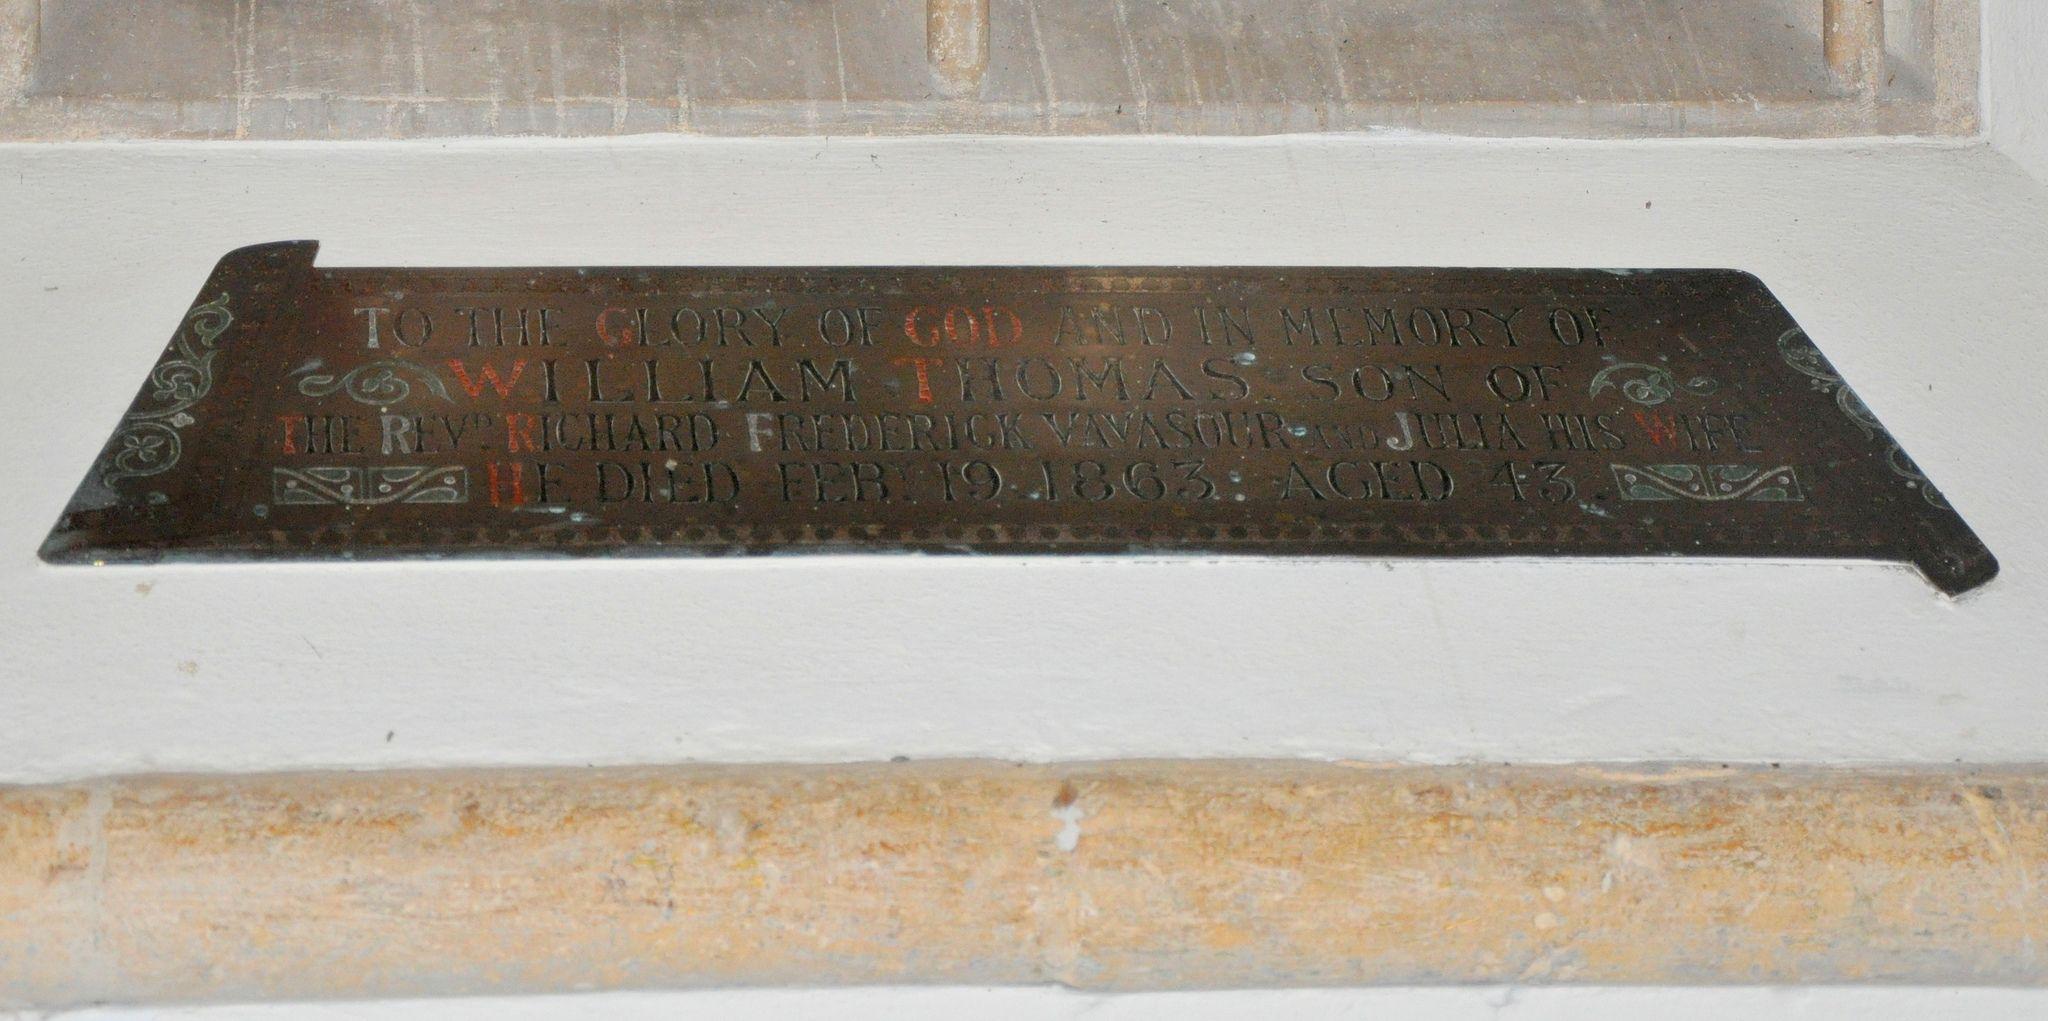 https://flic.kr/p/cRxJ3d | Broadwell-086 St Paul North chancel window c1867 memorial glass | Broadwell gurgles and bubbles with…